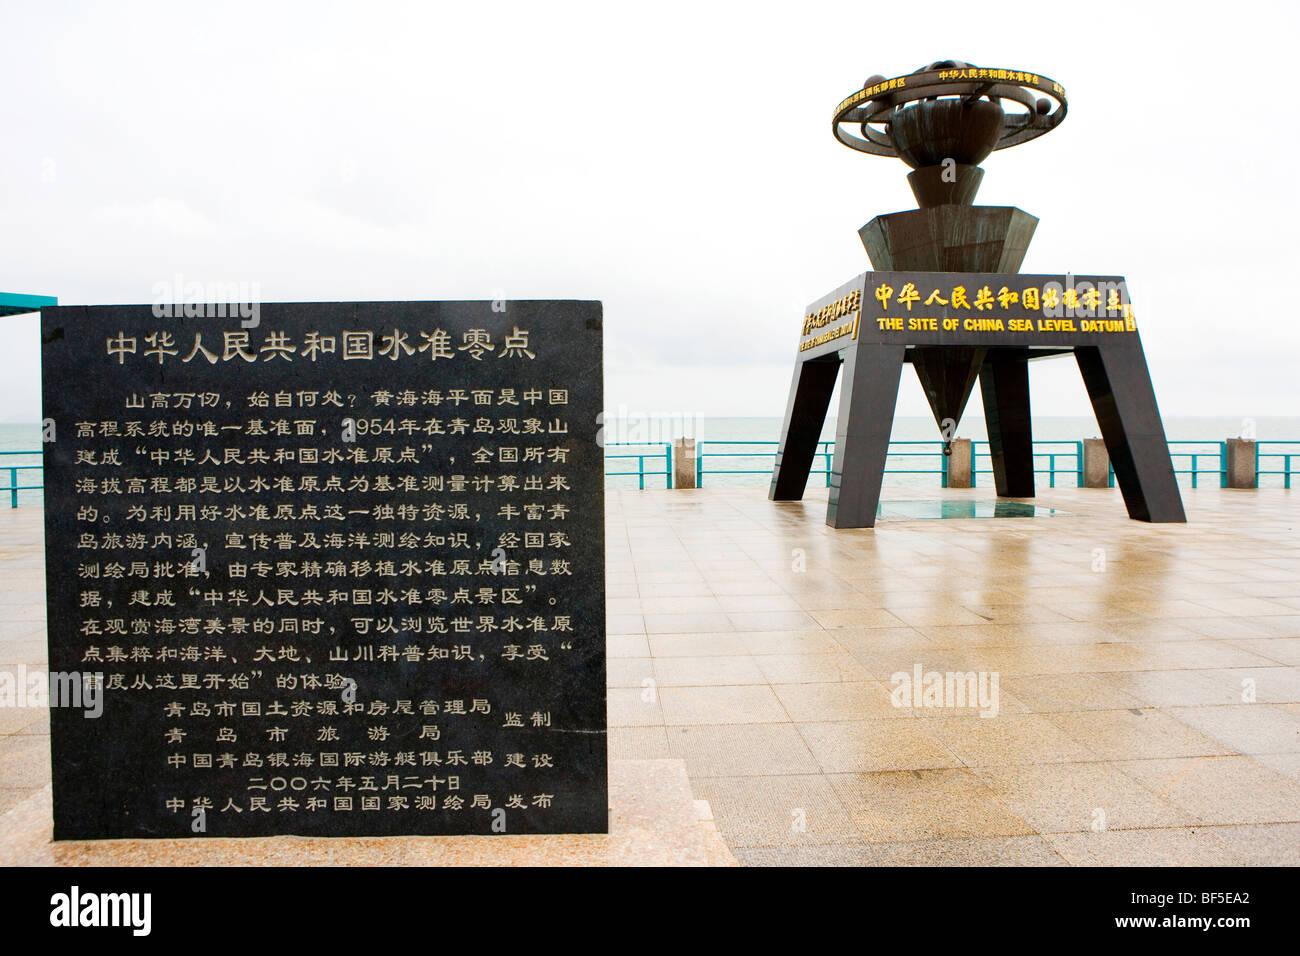 The Site Of China Sea Level Datum, Qingdao City, Shandong, China - Stock Image